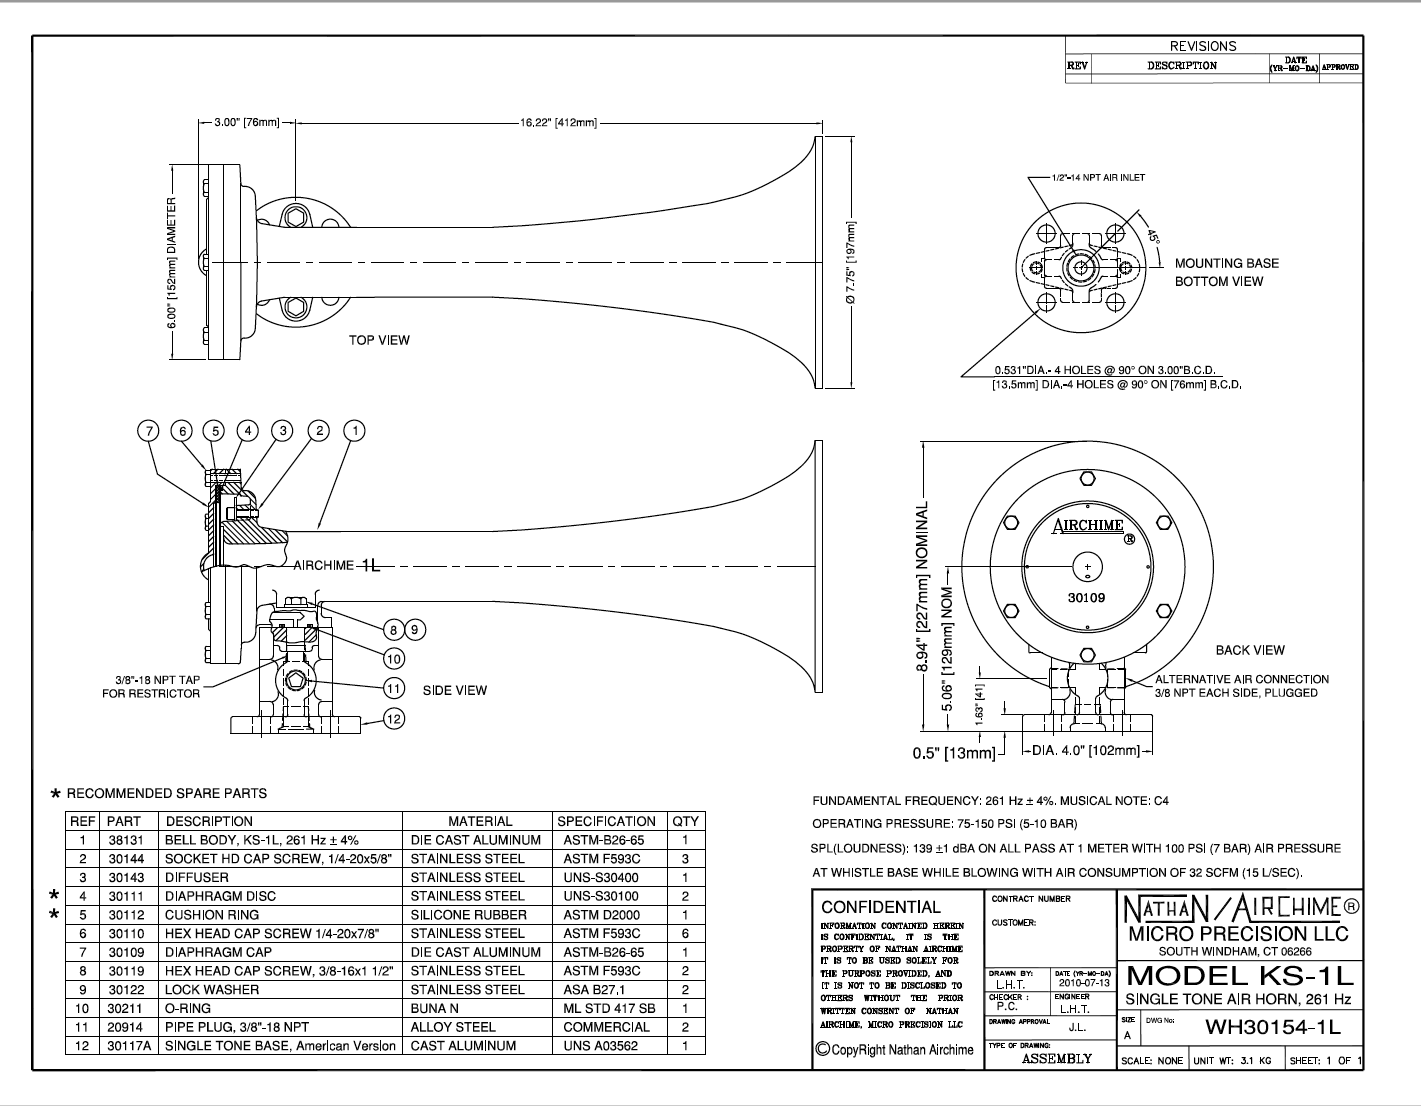 Nathan Airchime KS-1L Train horn